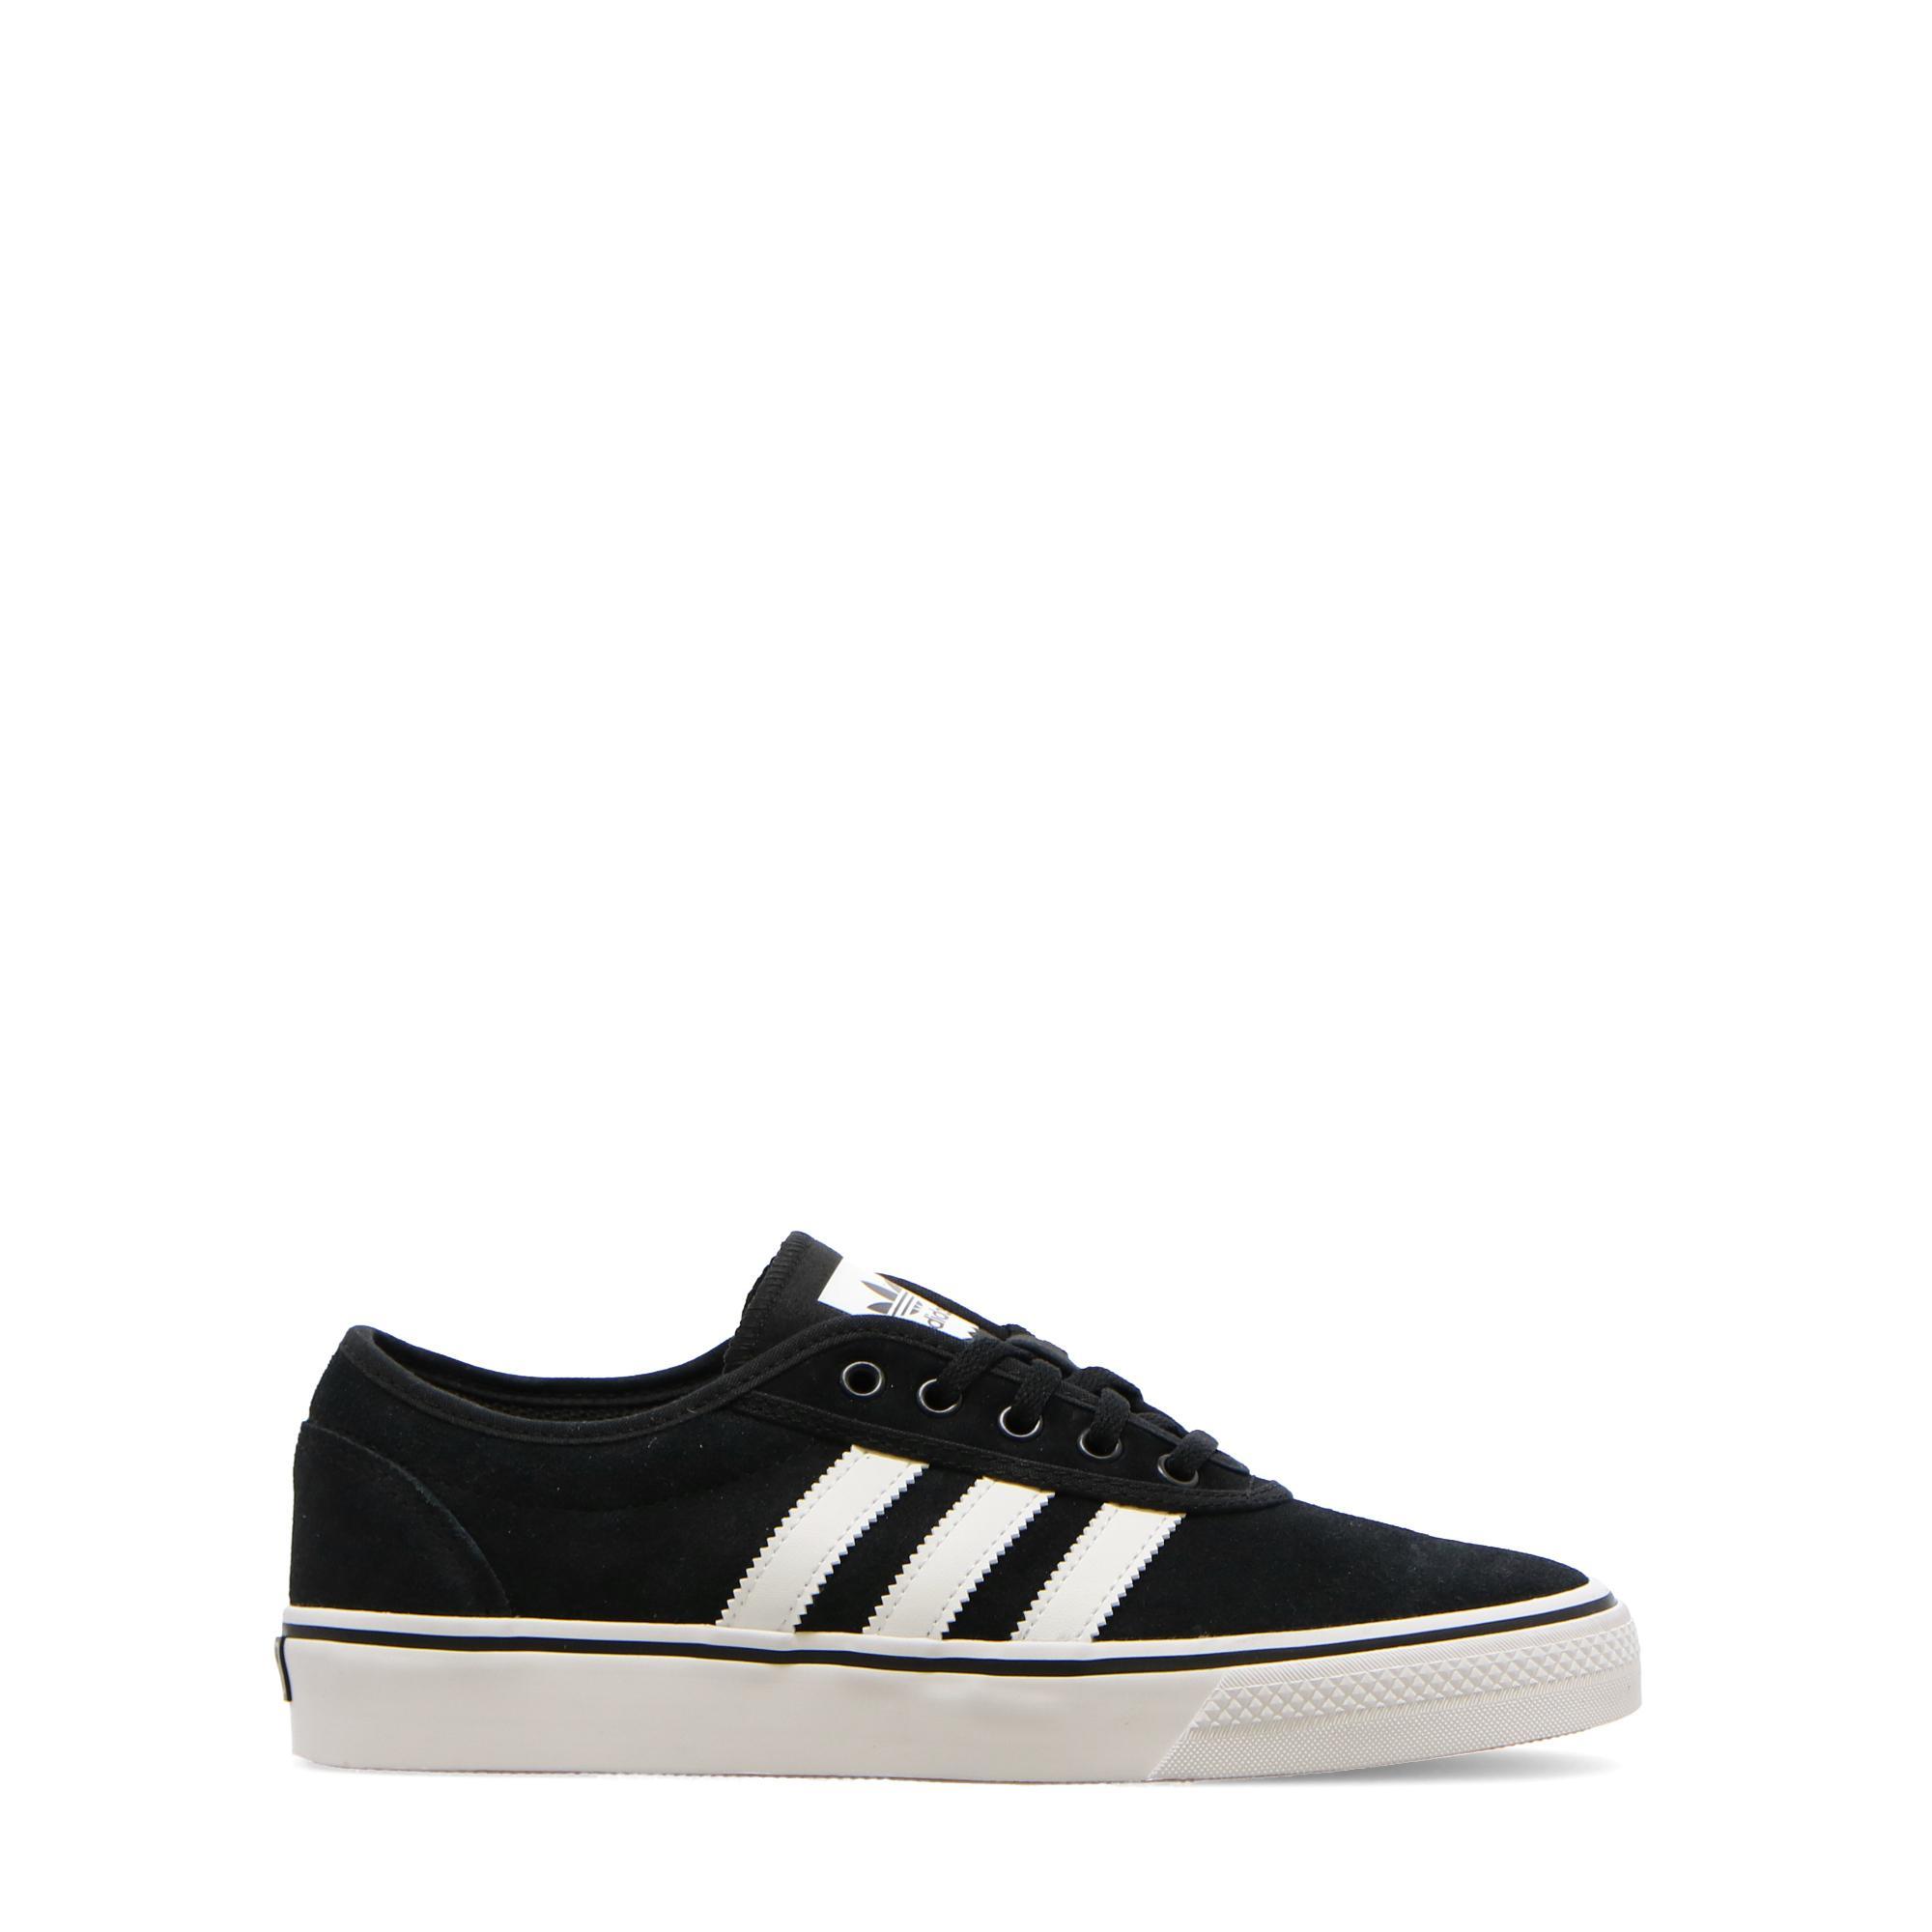 Adidas Adi-ease<br/> Black white black